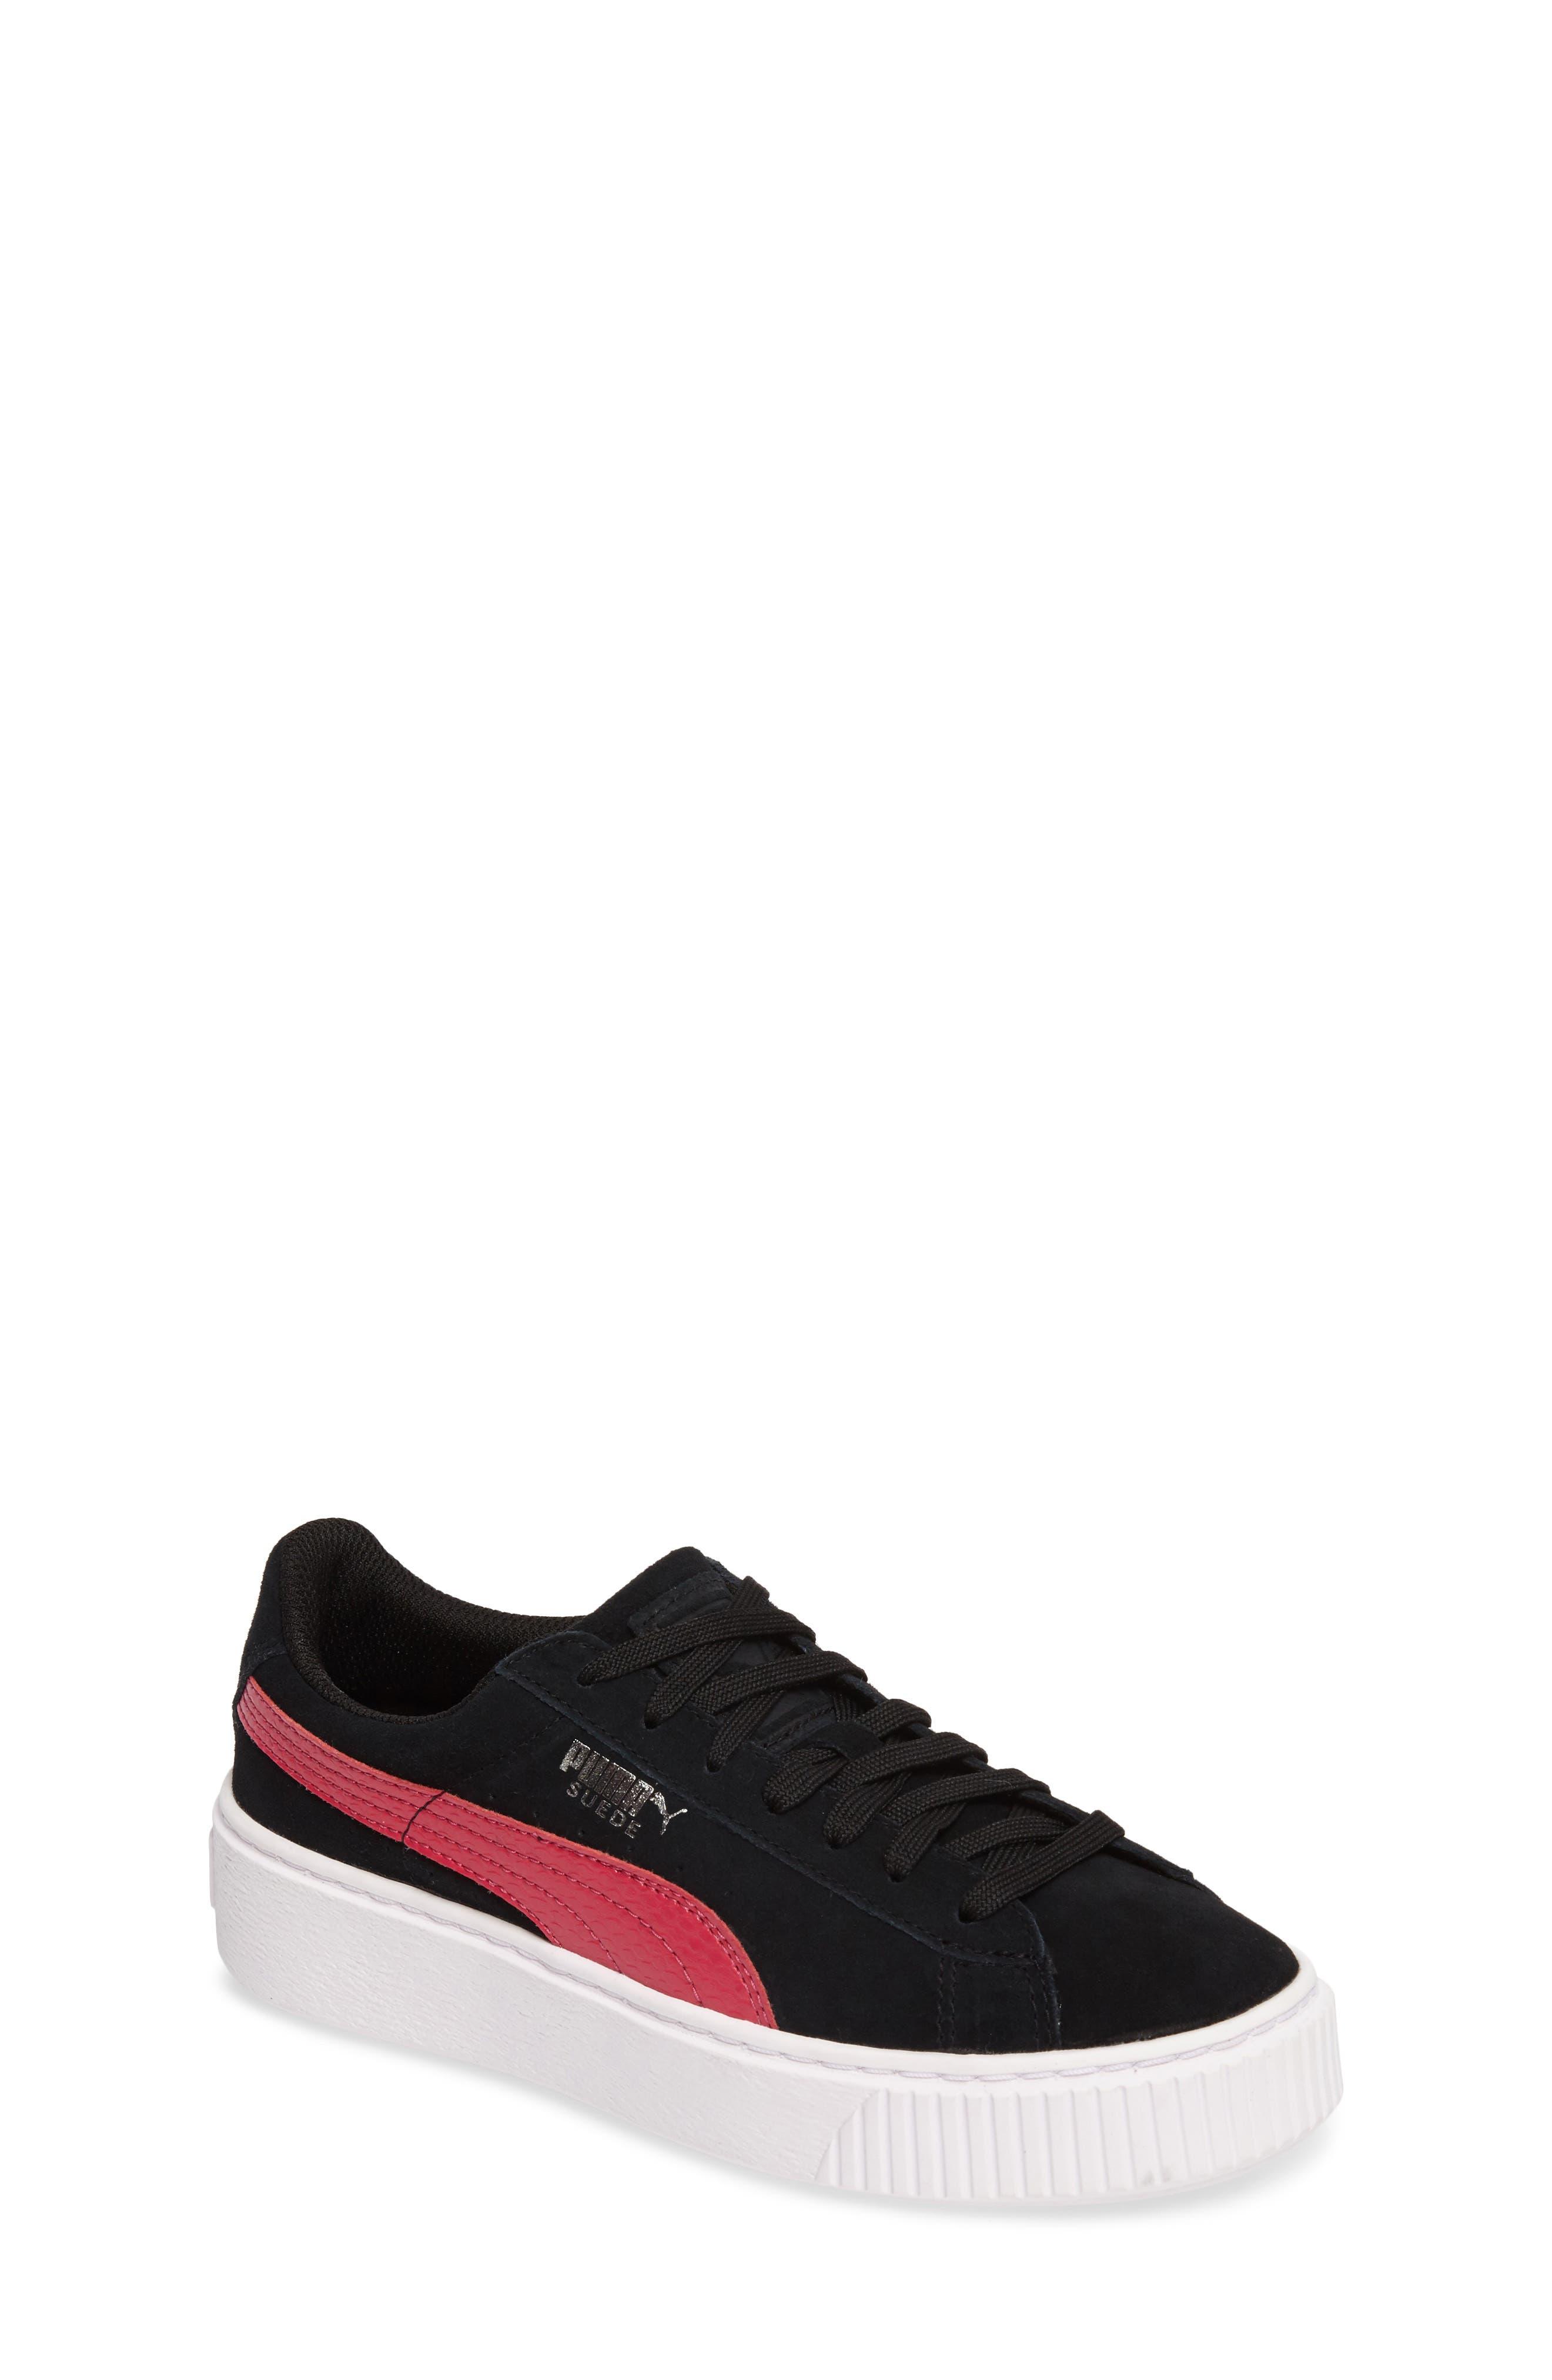 PUMA Platform Sneaker (Big Kid)